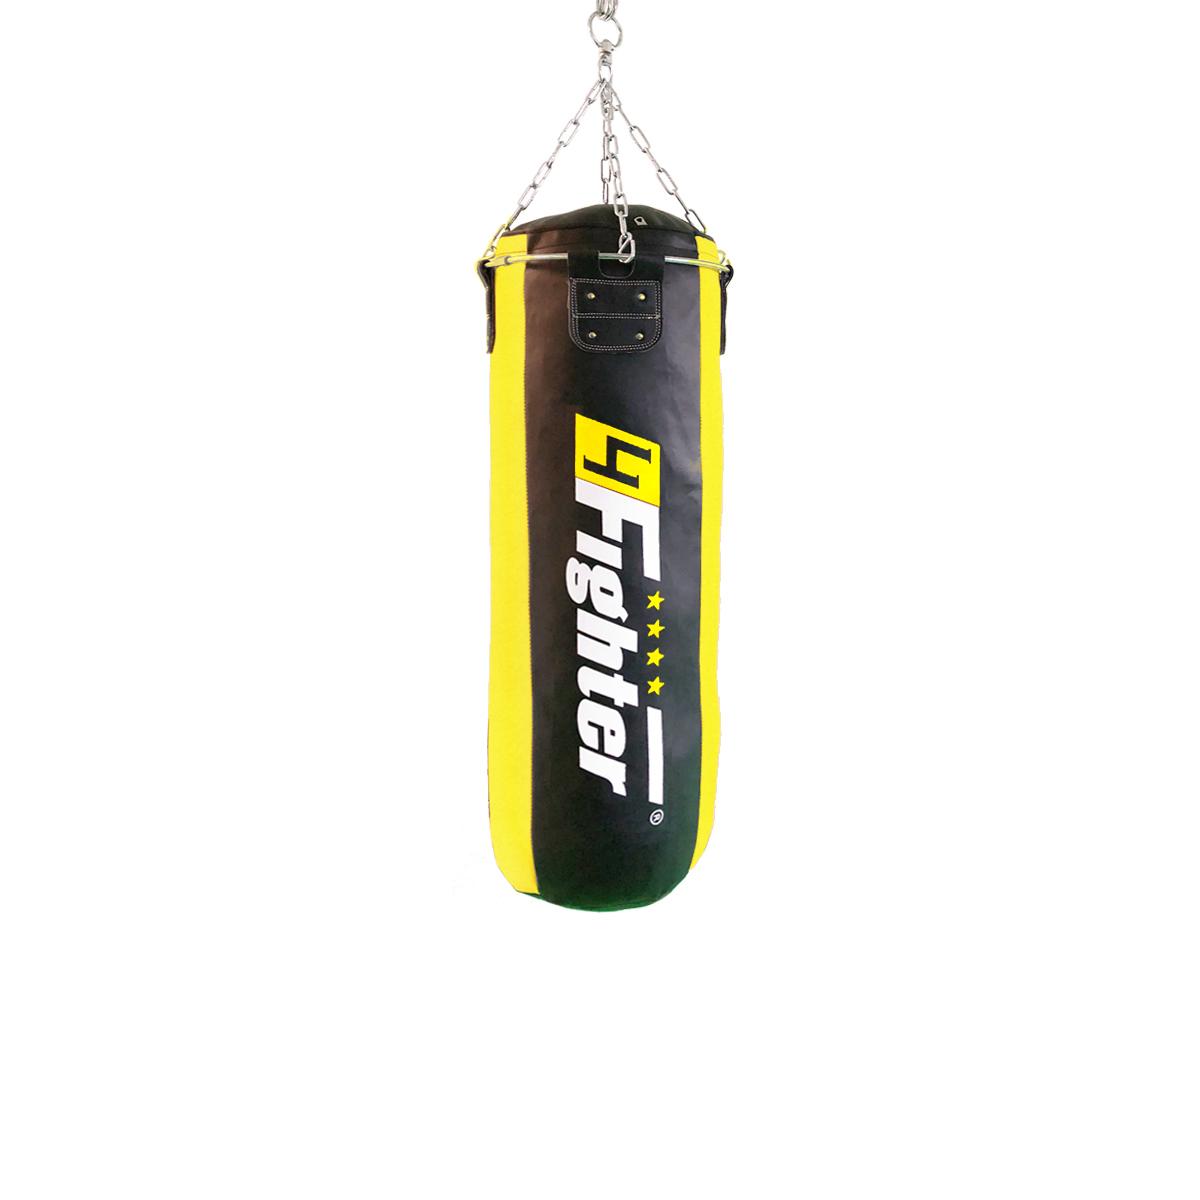 4Fighter Profi Kunstleder Boxsack / Sandsack - schwarz/gelb, ungefüllt 100cm